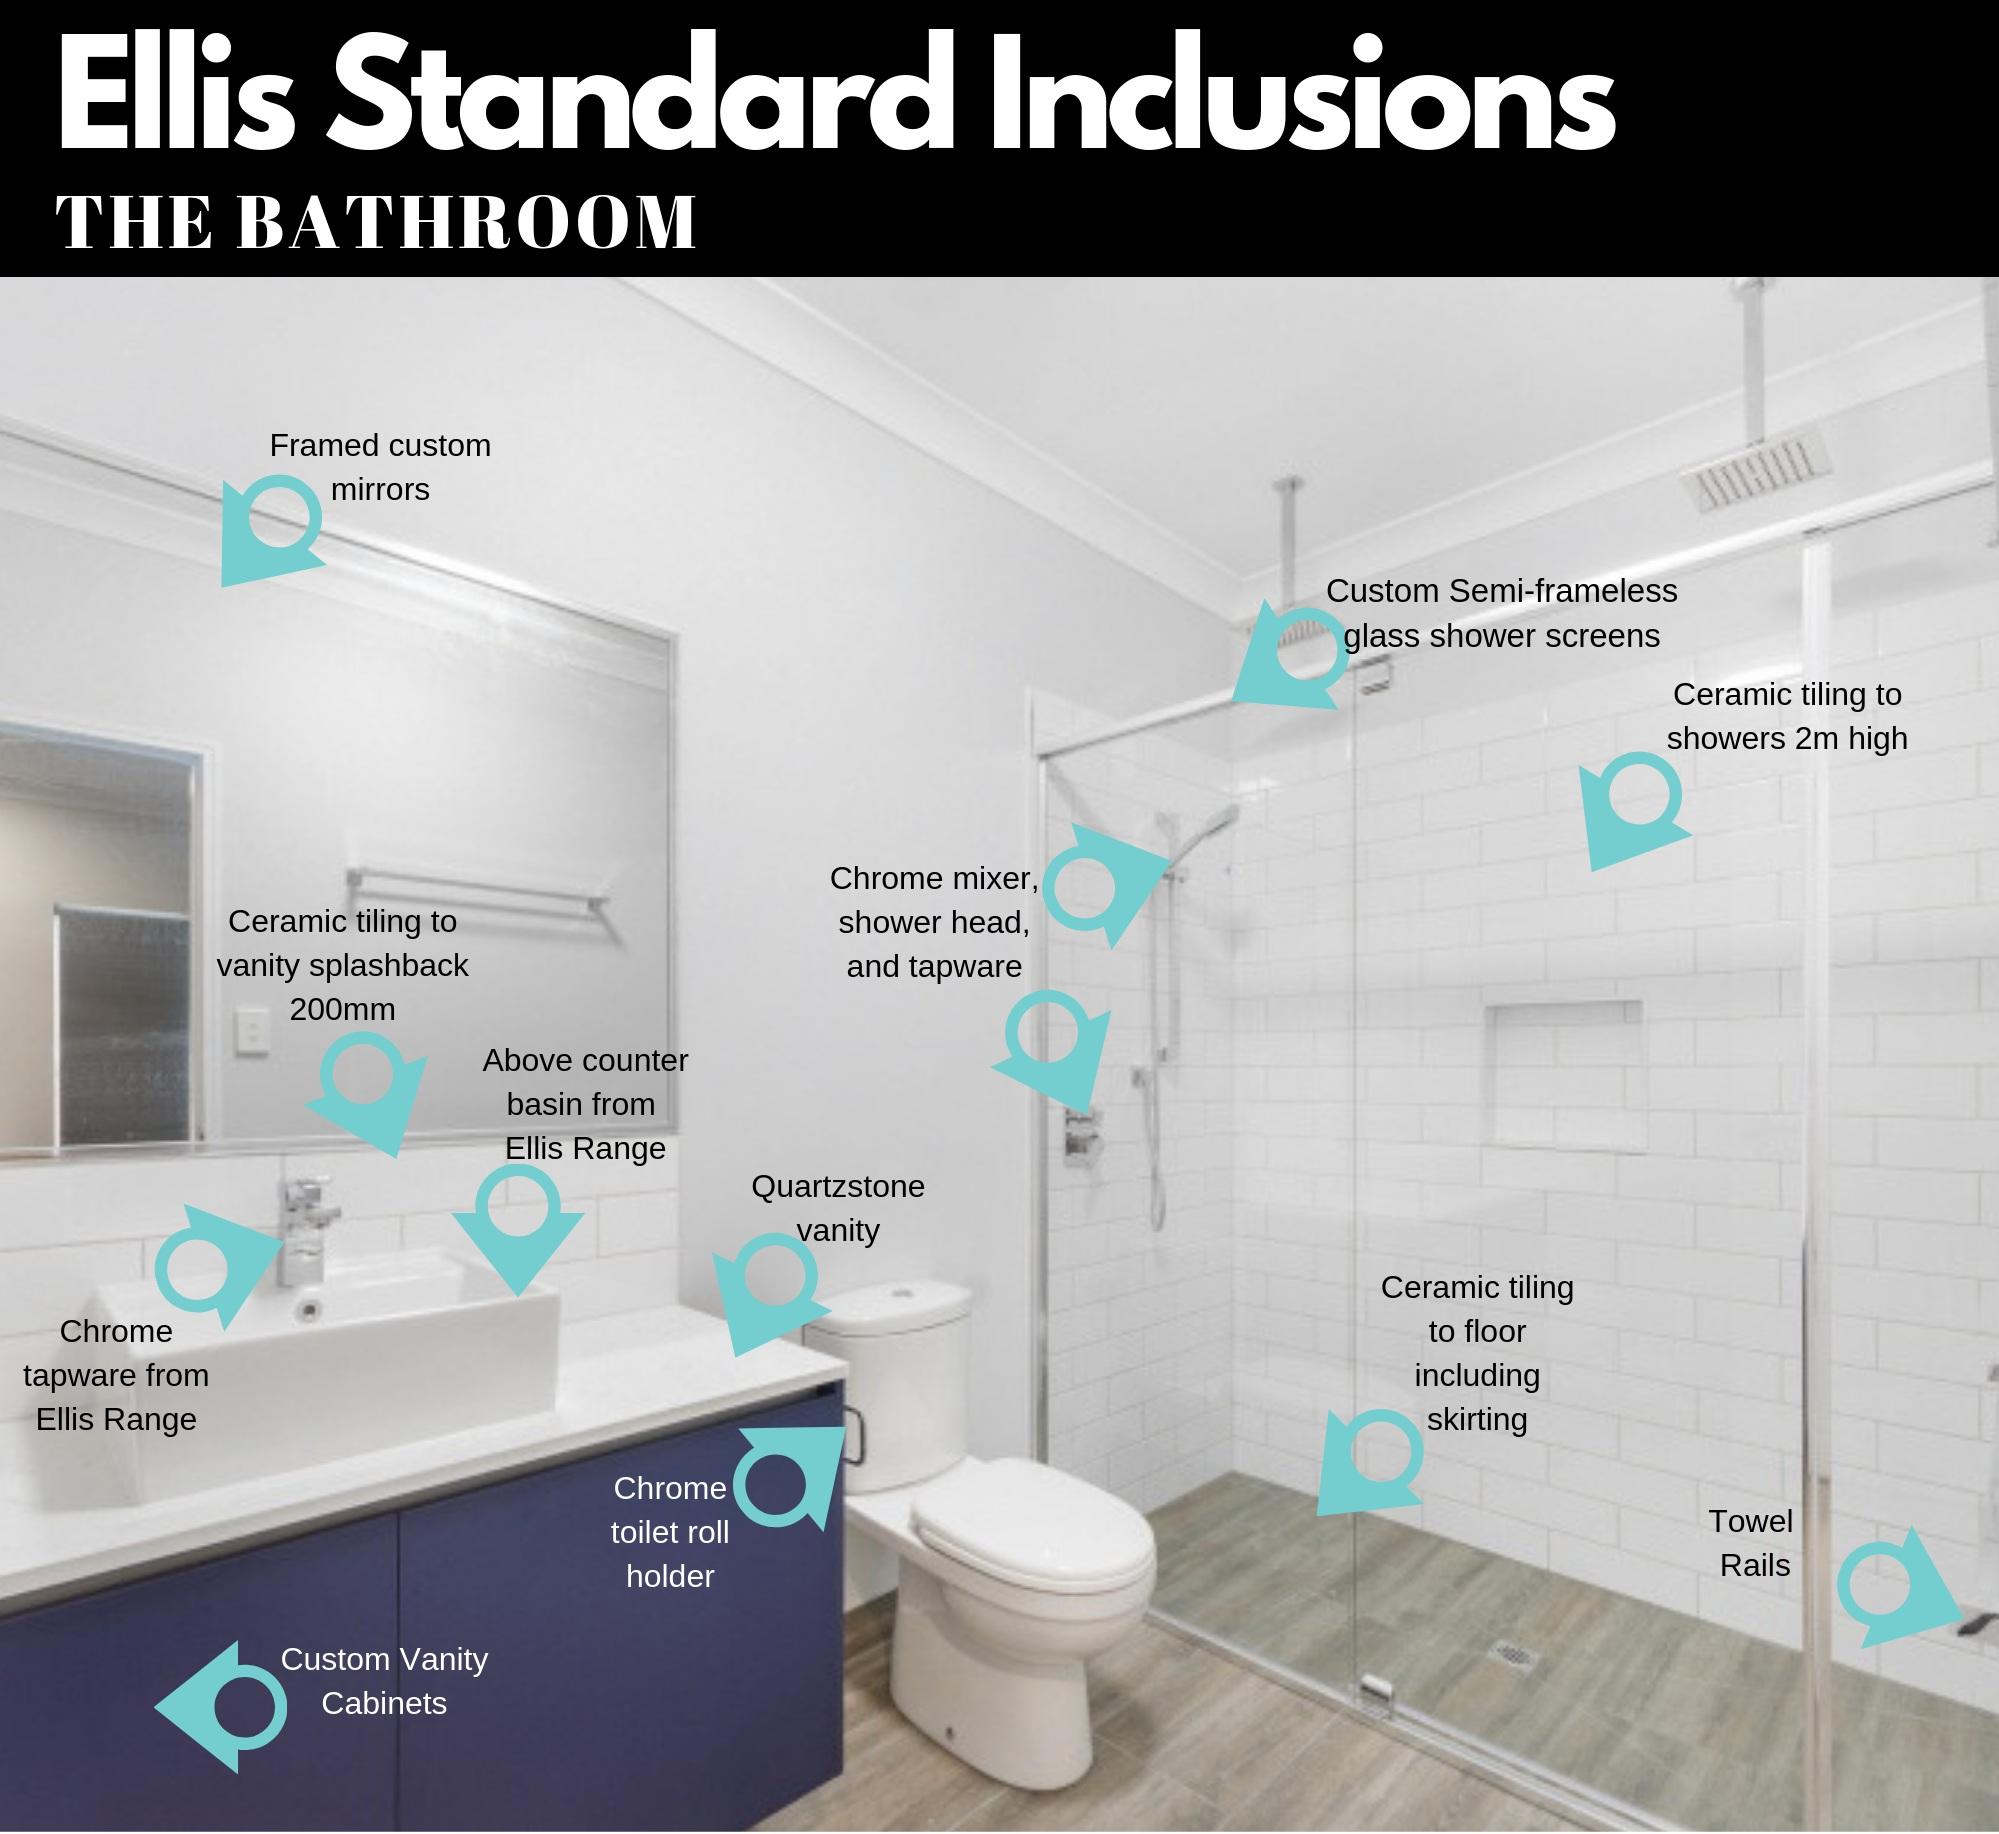 EllisDevelopments_StandardInclusions_Bathrooms.jpg